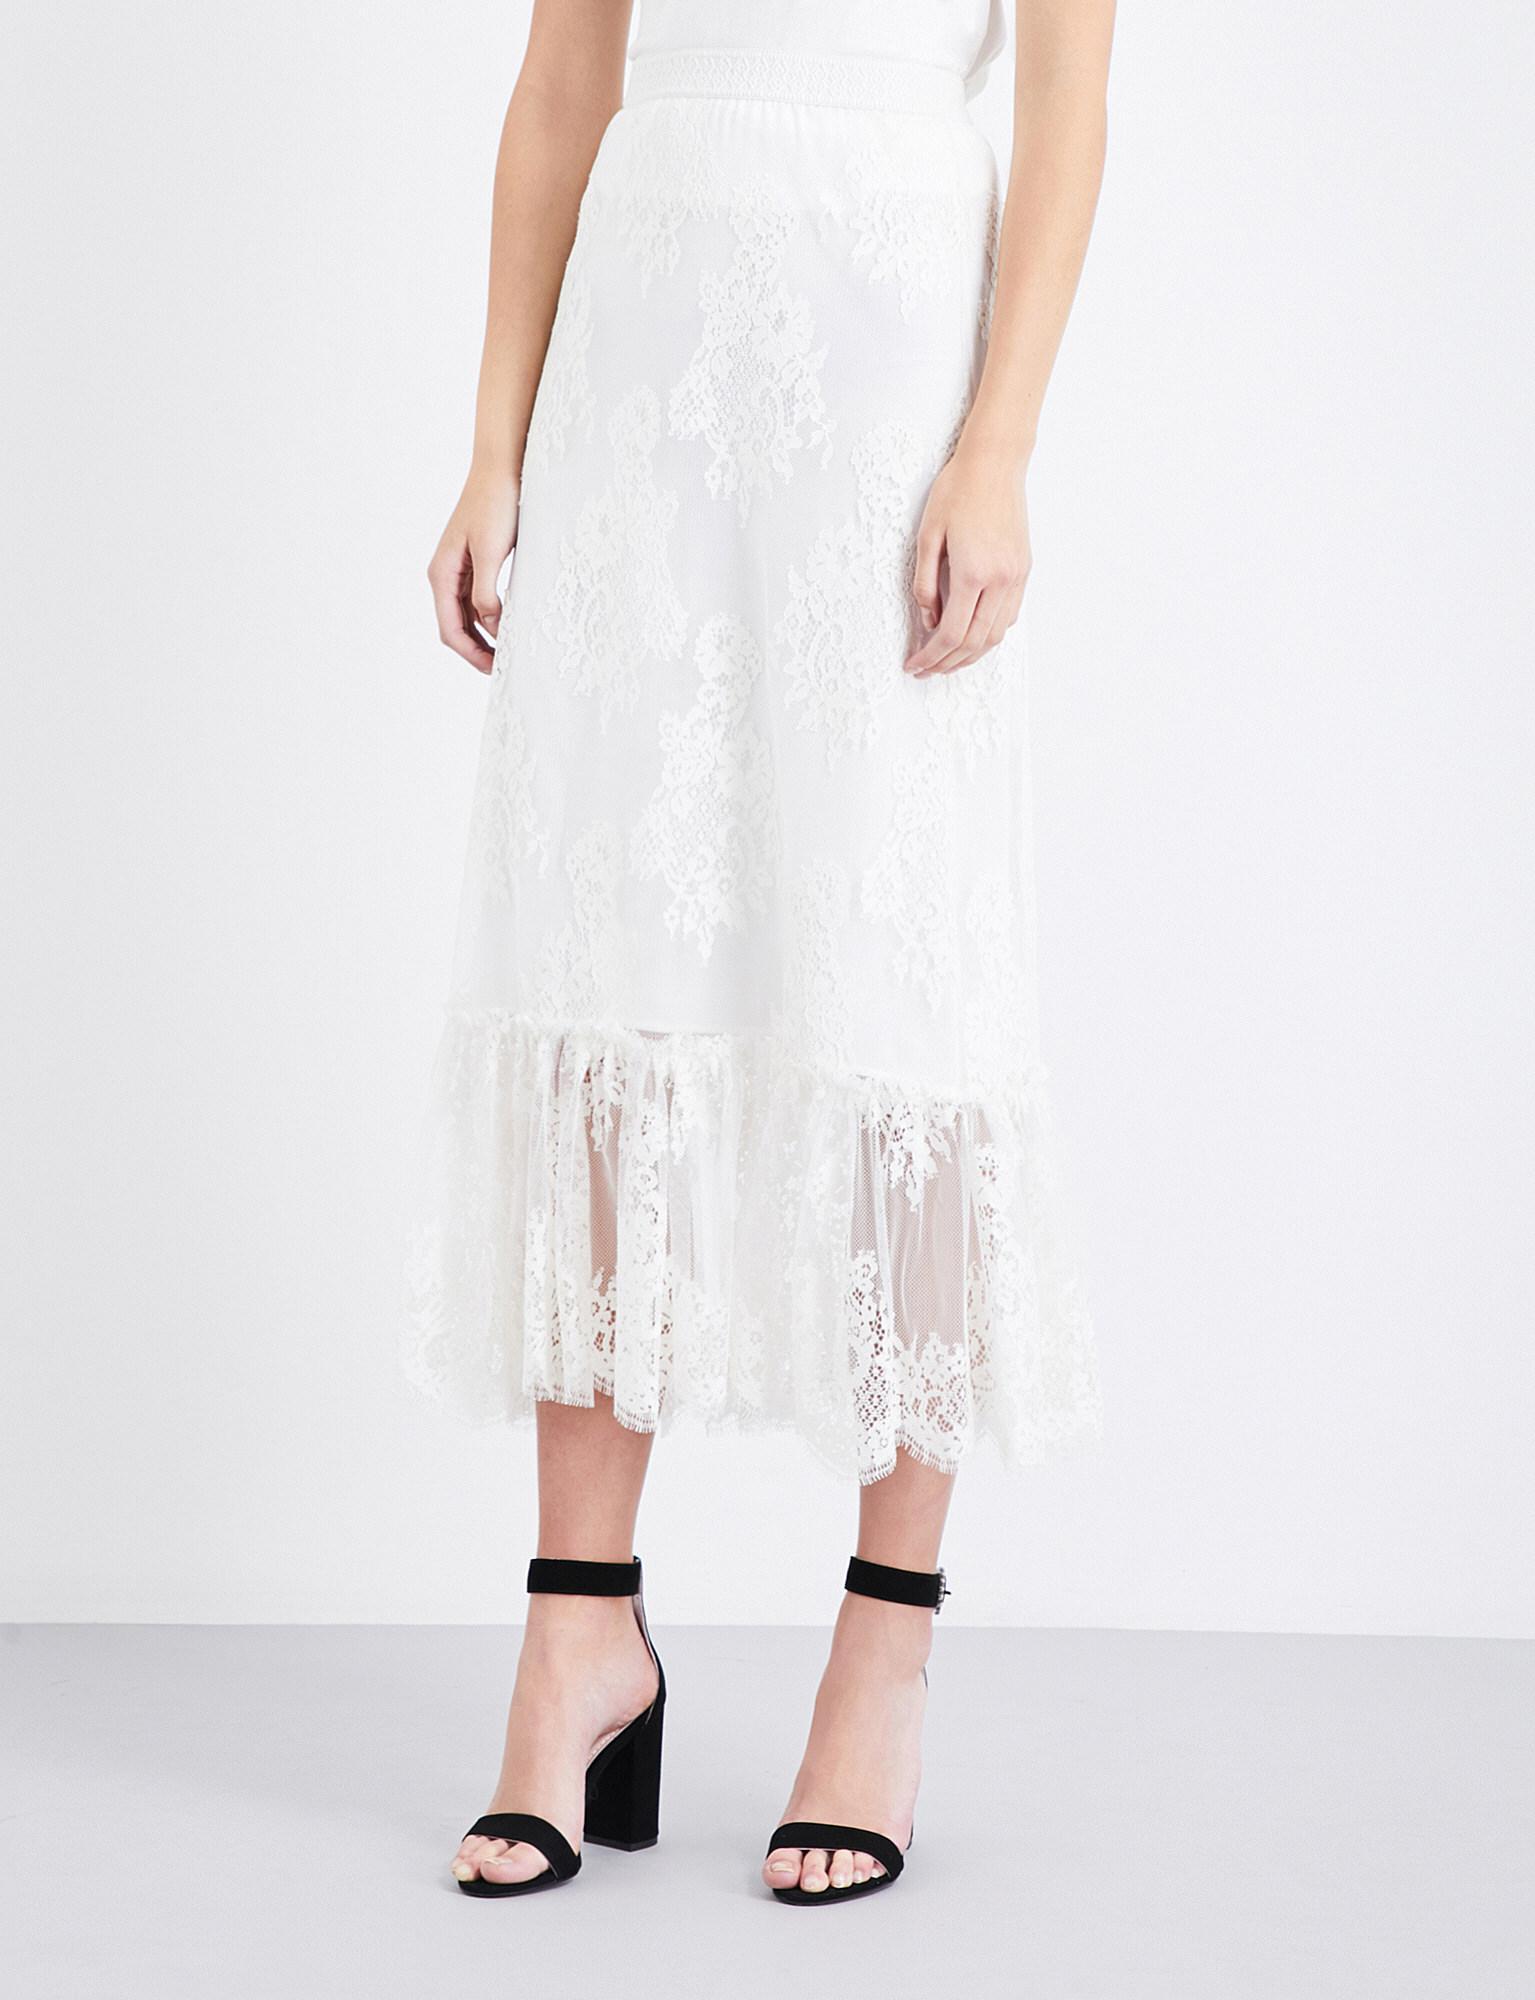 788a786bbc Maje Jilane Lace Skirt in White - Lyst